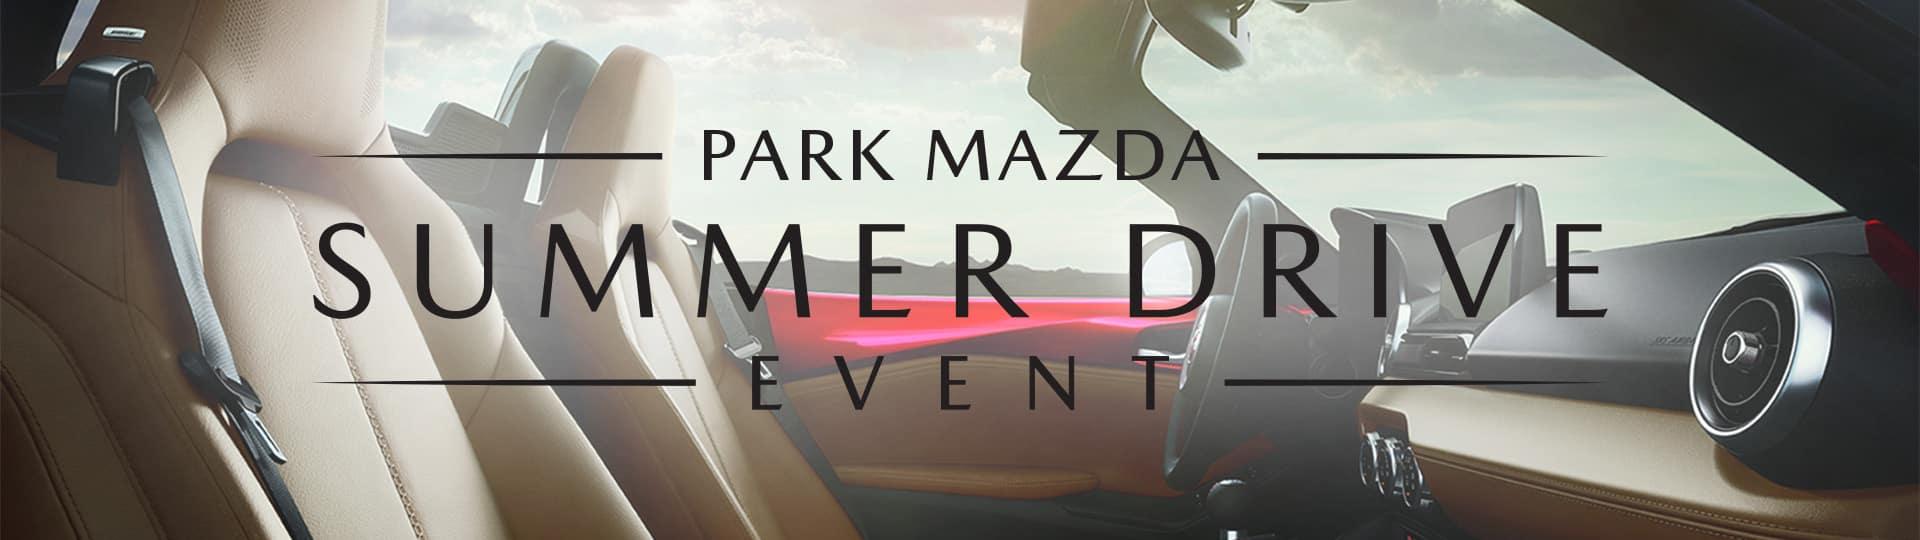 summer_drive_event_2021_landing_page_DESKTOP_1920x540px